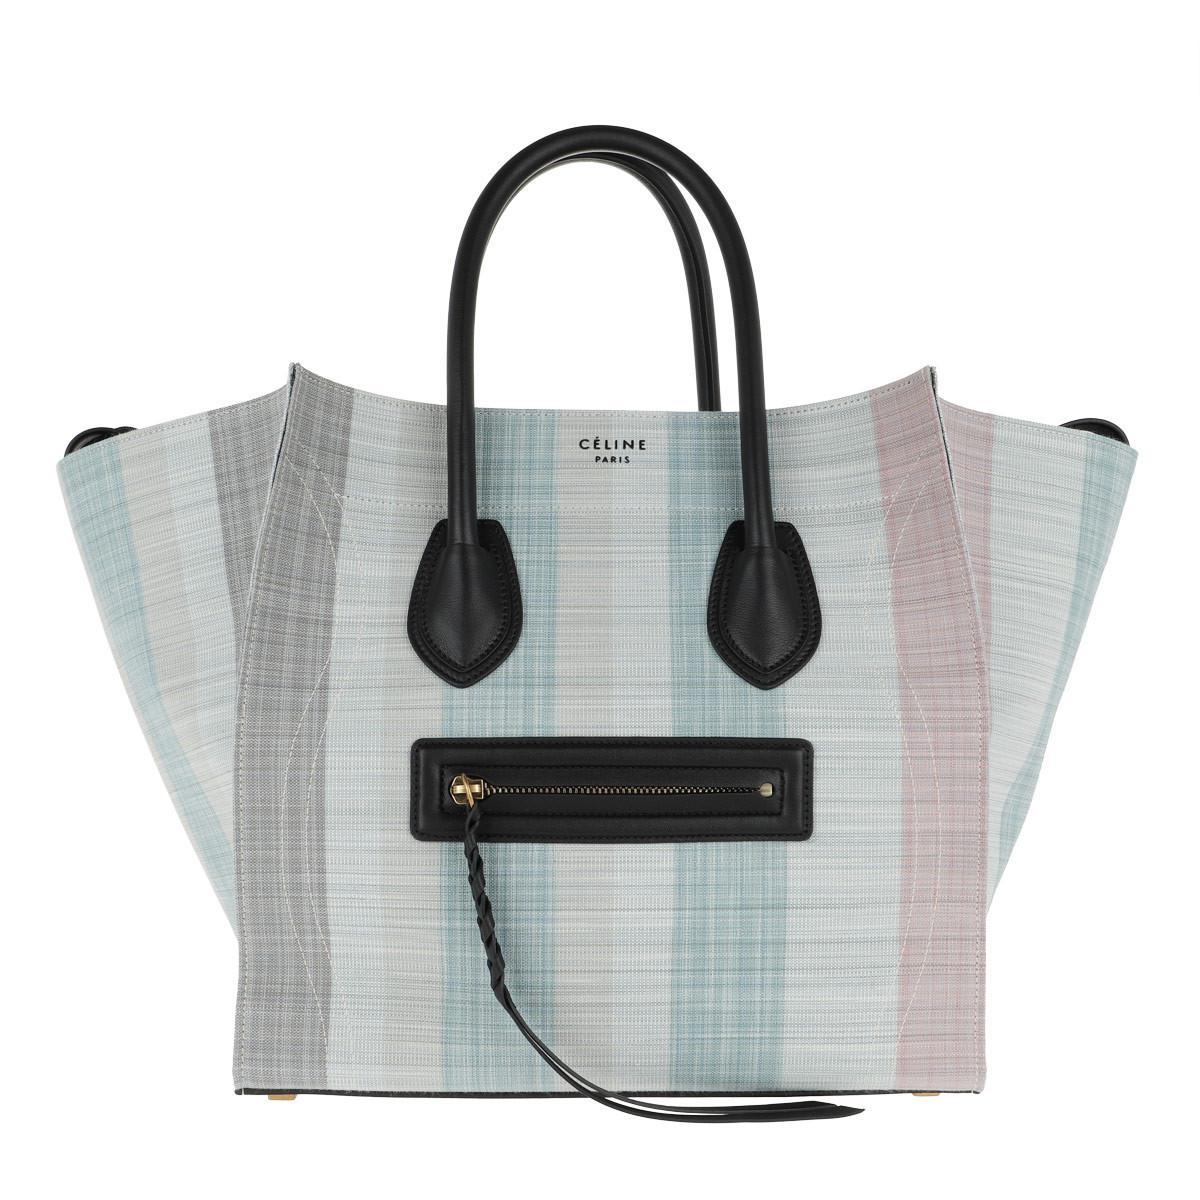 07060cd56e88 Céline Phantom Micro Luggage Bag Leather Blu - Lyst